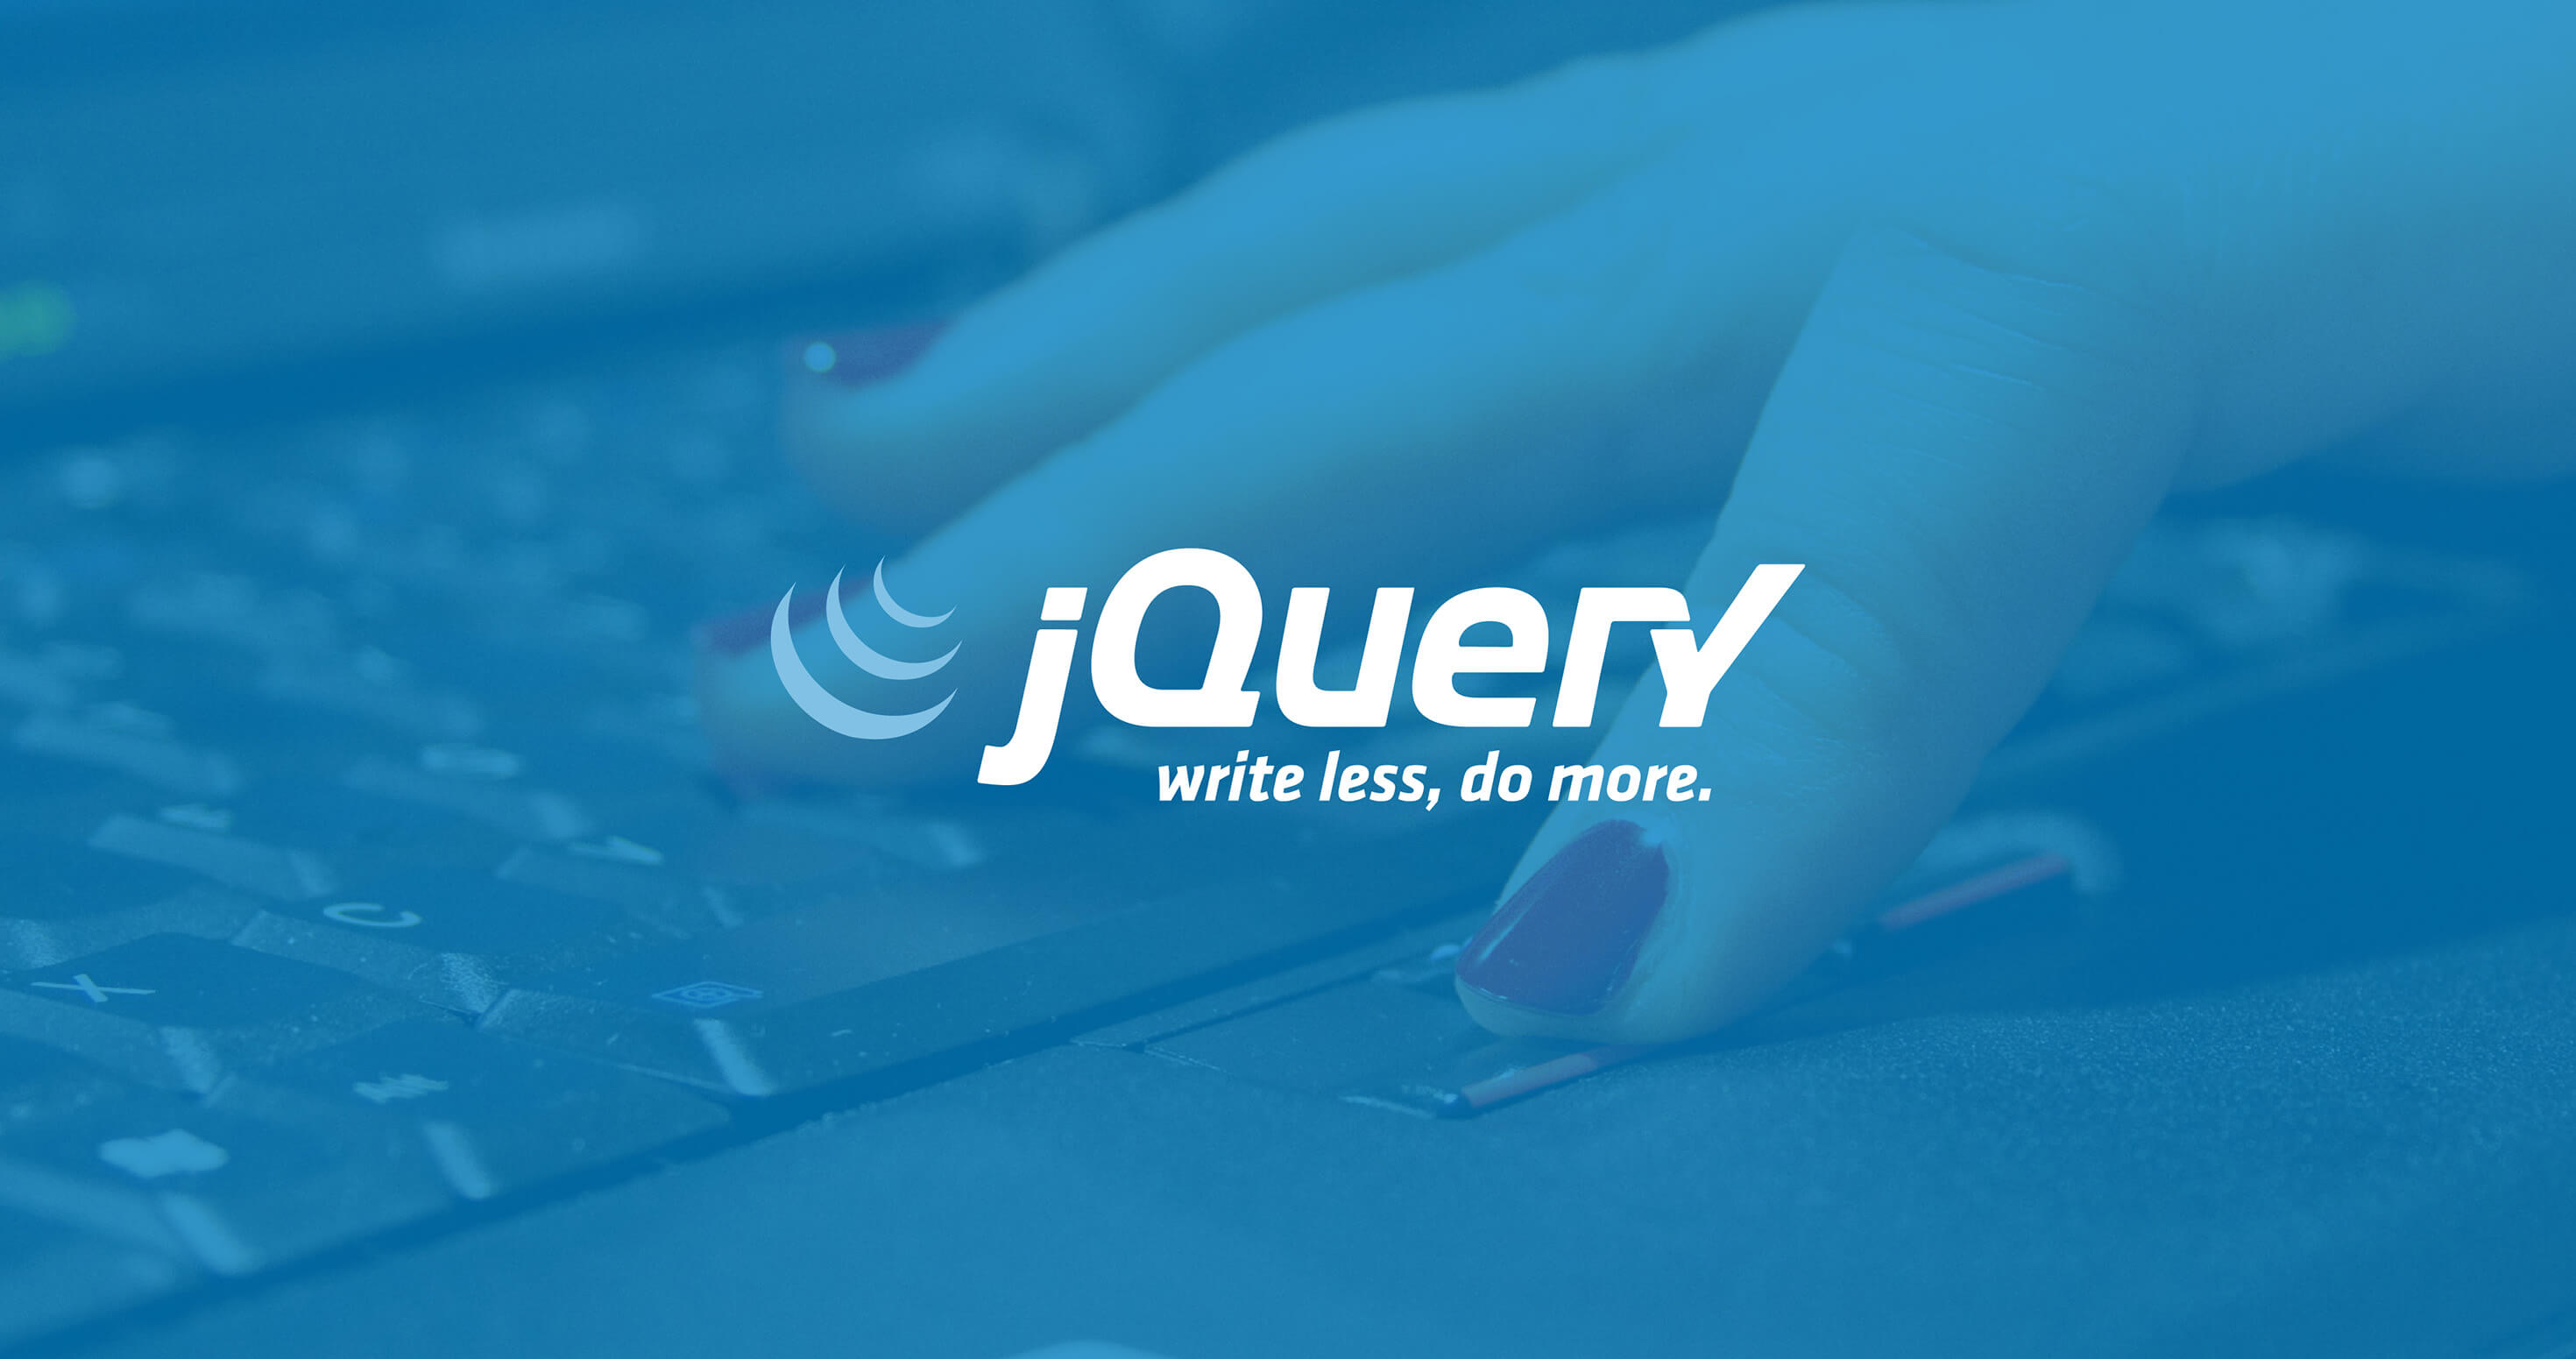 jQuery   Vecuro   Webdesign and Development